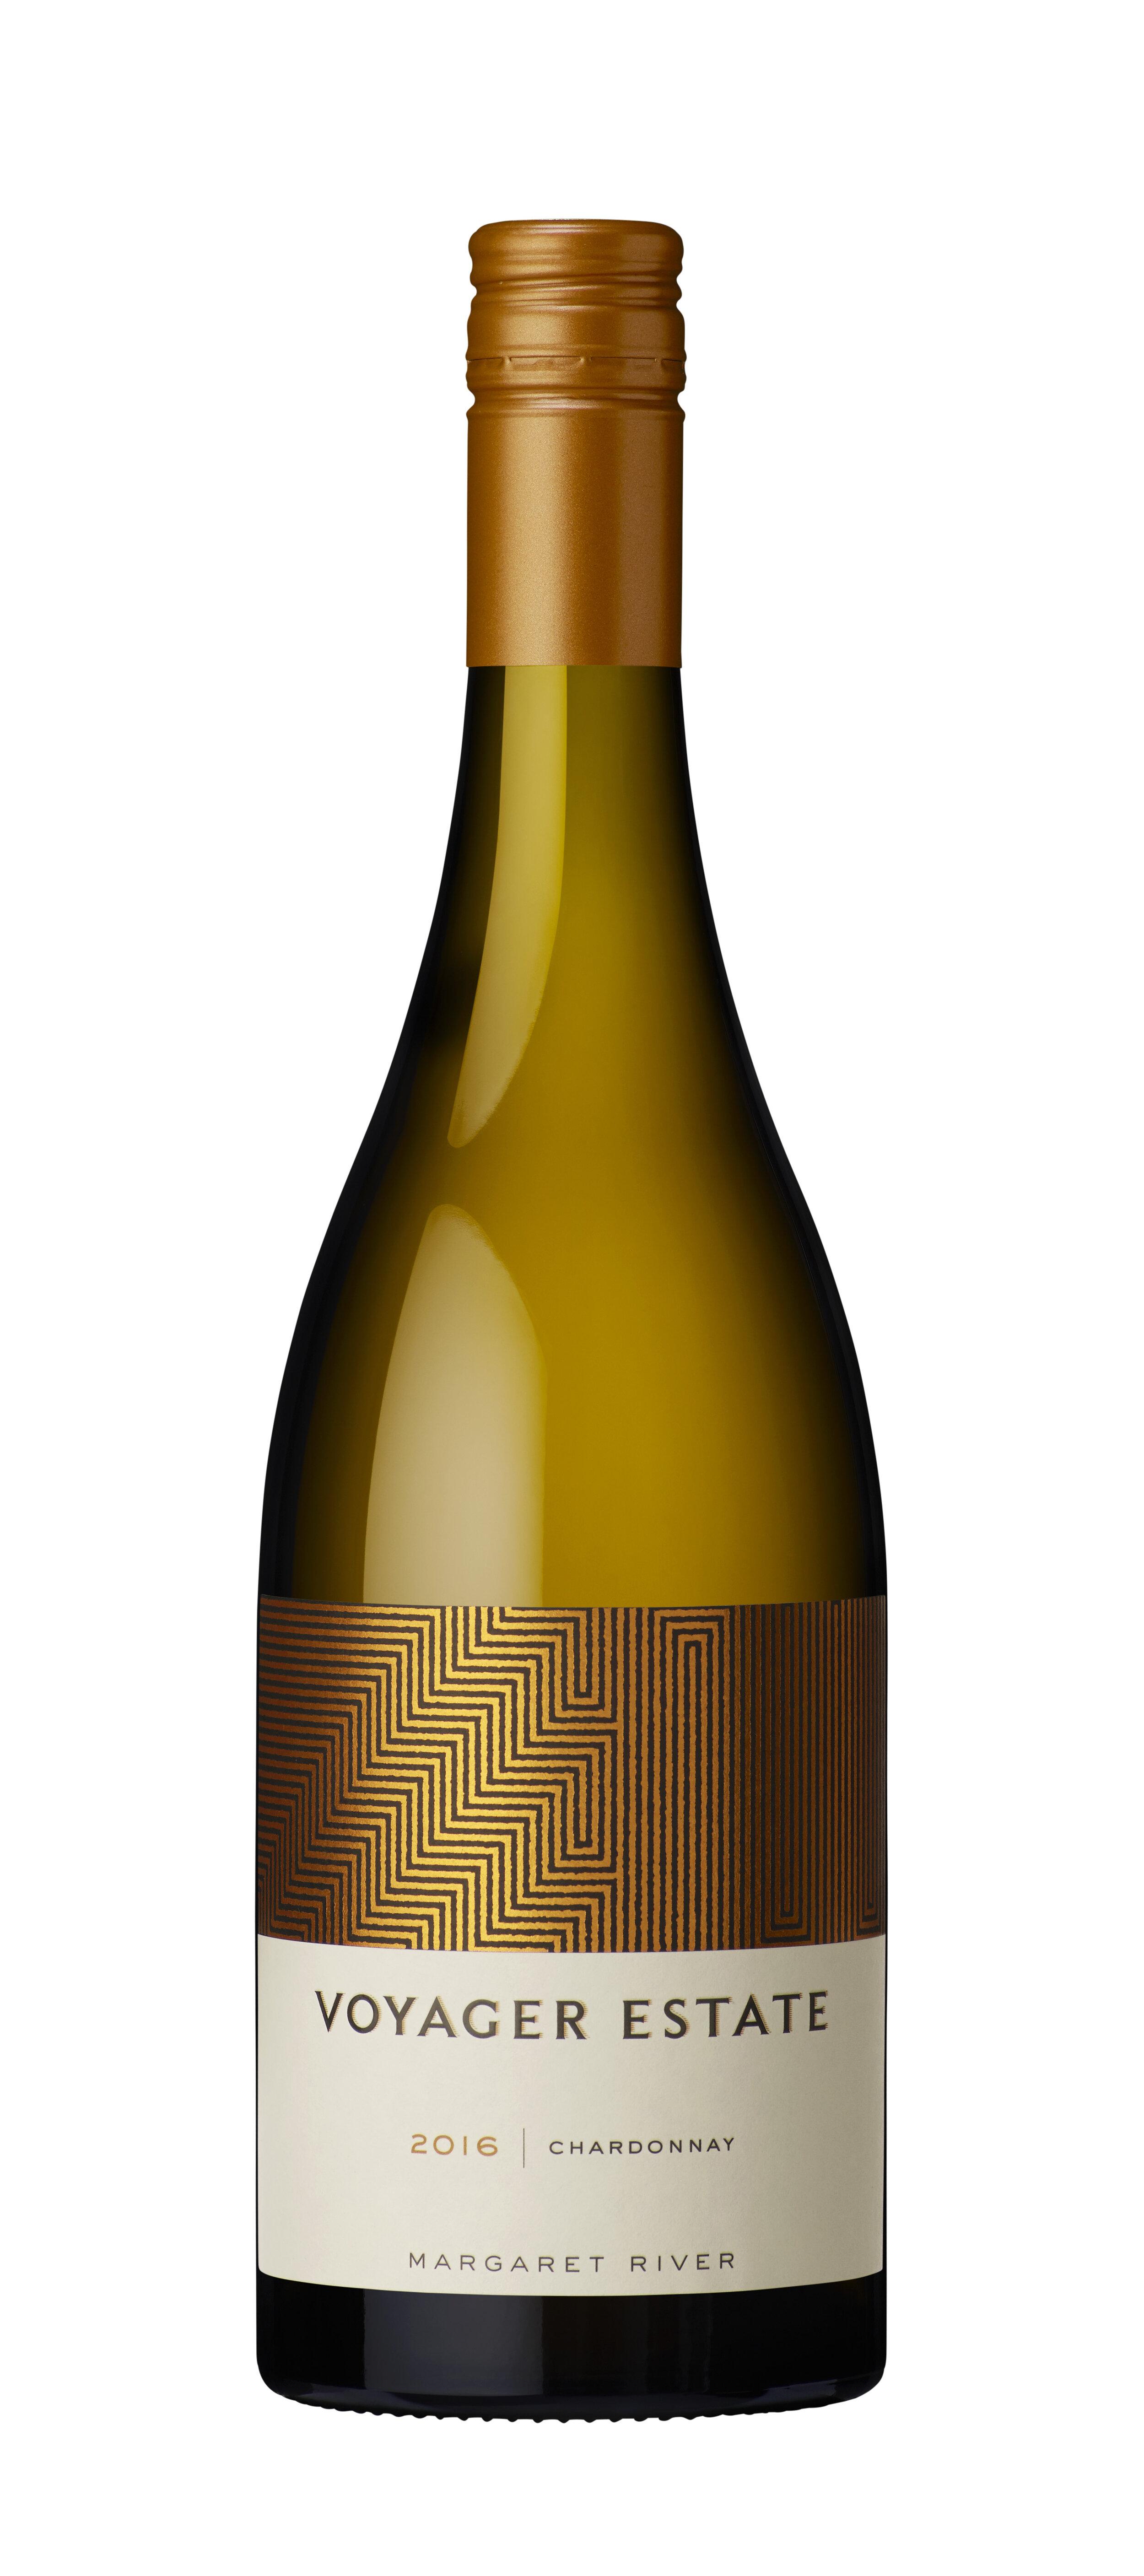 Voyager Estate Chardonnay